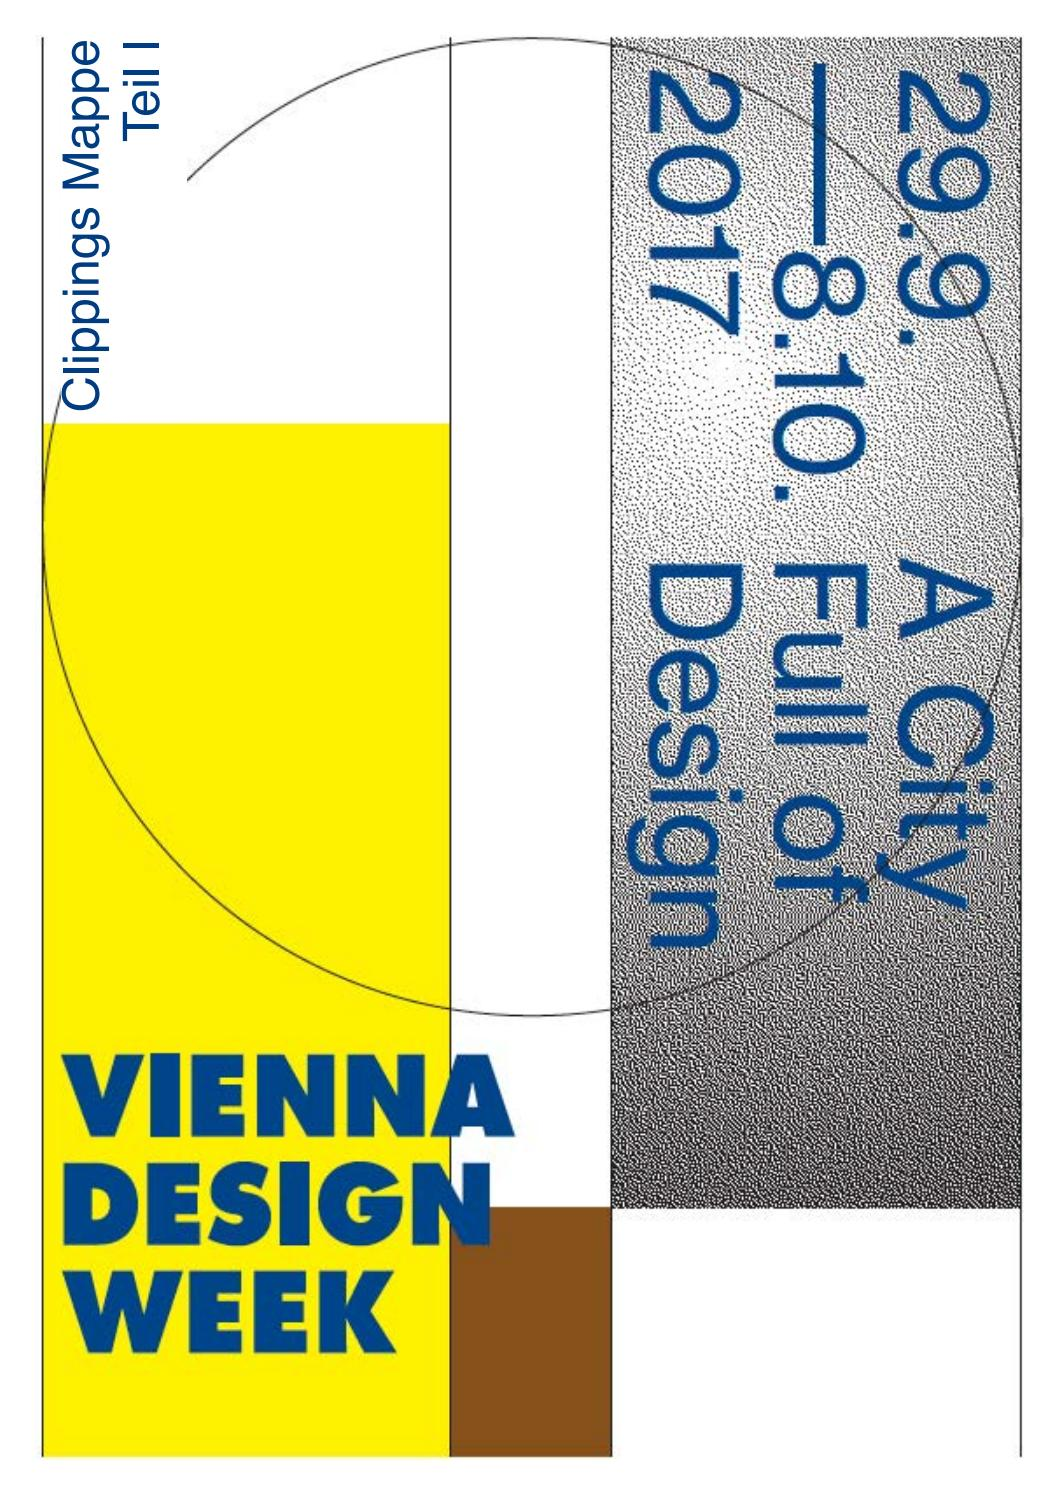 VIENNA DESIGN WEEK 2017 Clippings Teil 1 by Ana Berlin - issuu